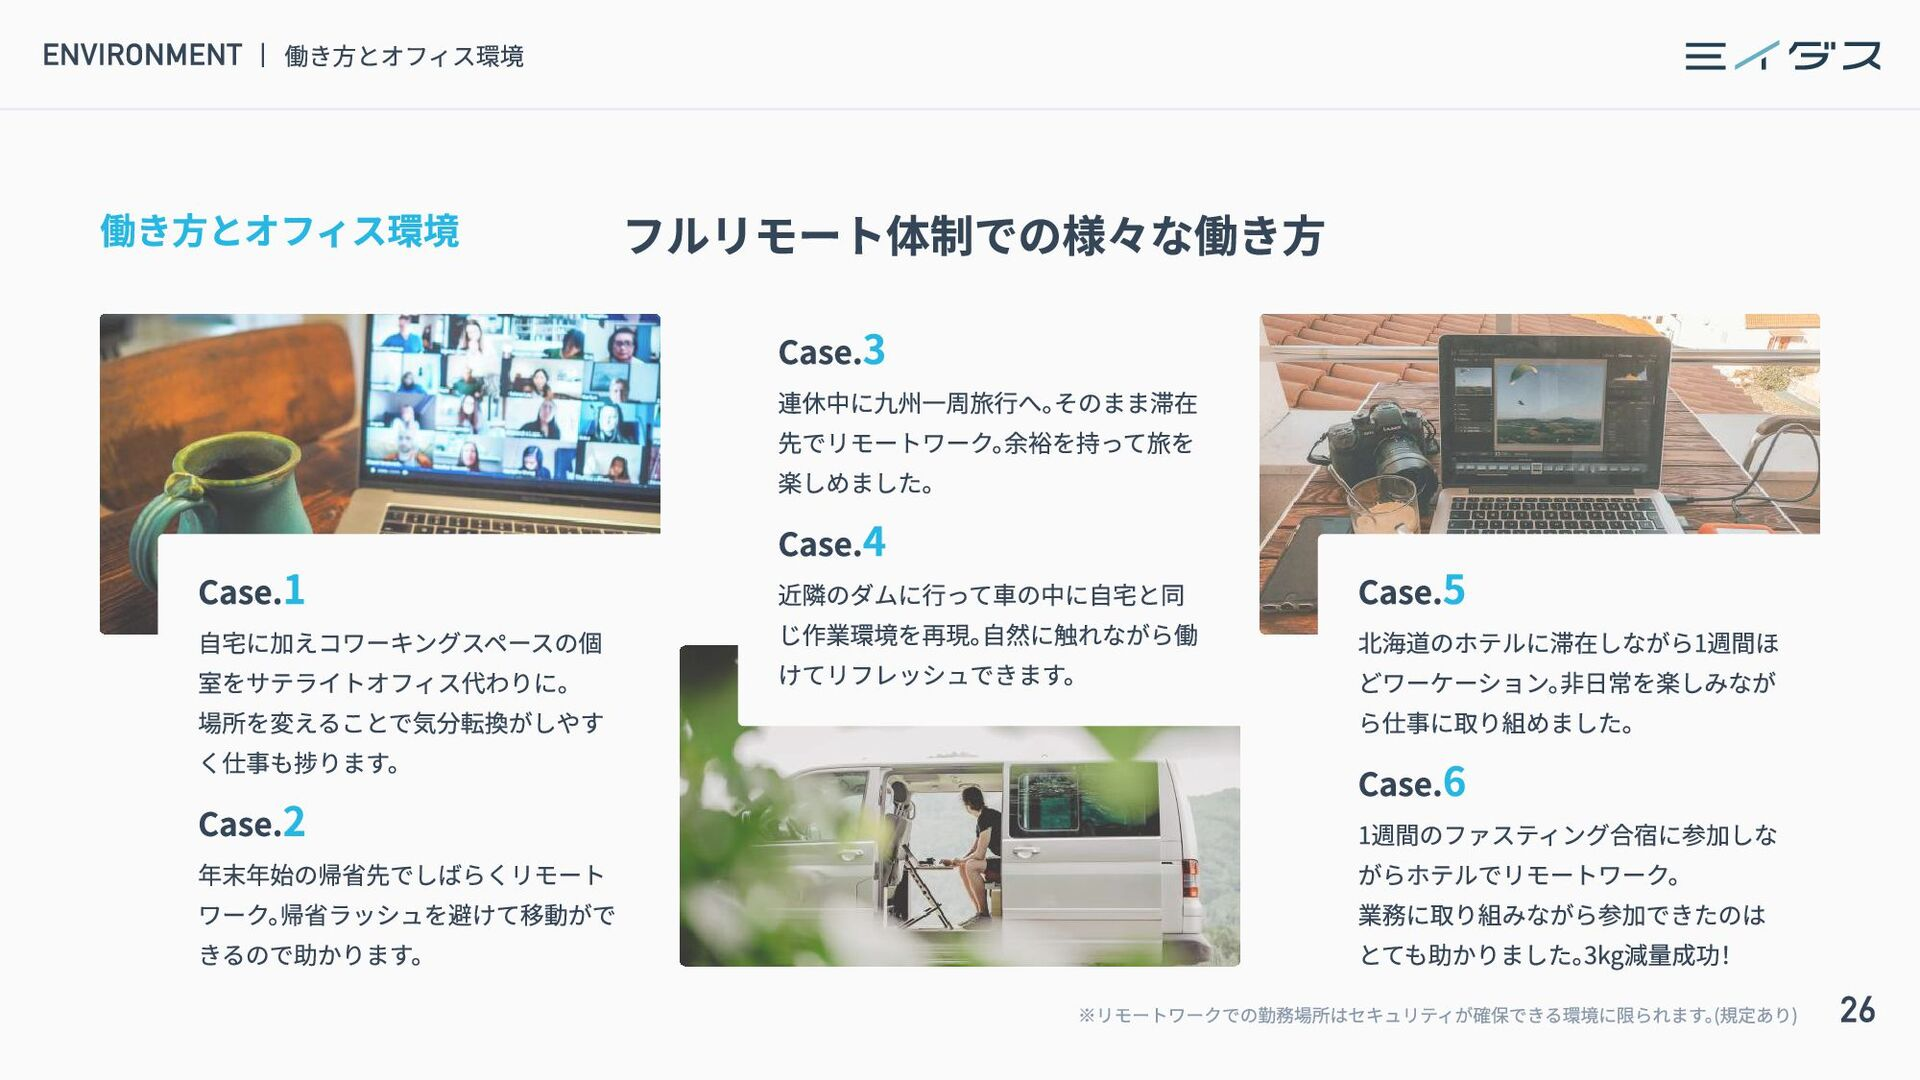 26 MESSAGE ミイダスからのメッセージ 目指す未来の実現に向けて ミイダスは、 人や組...